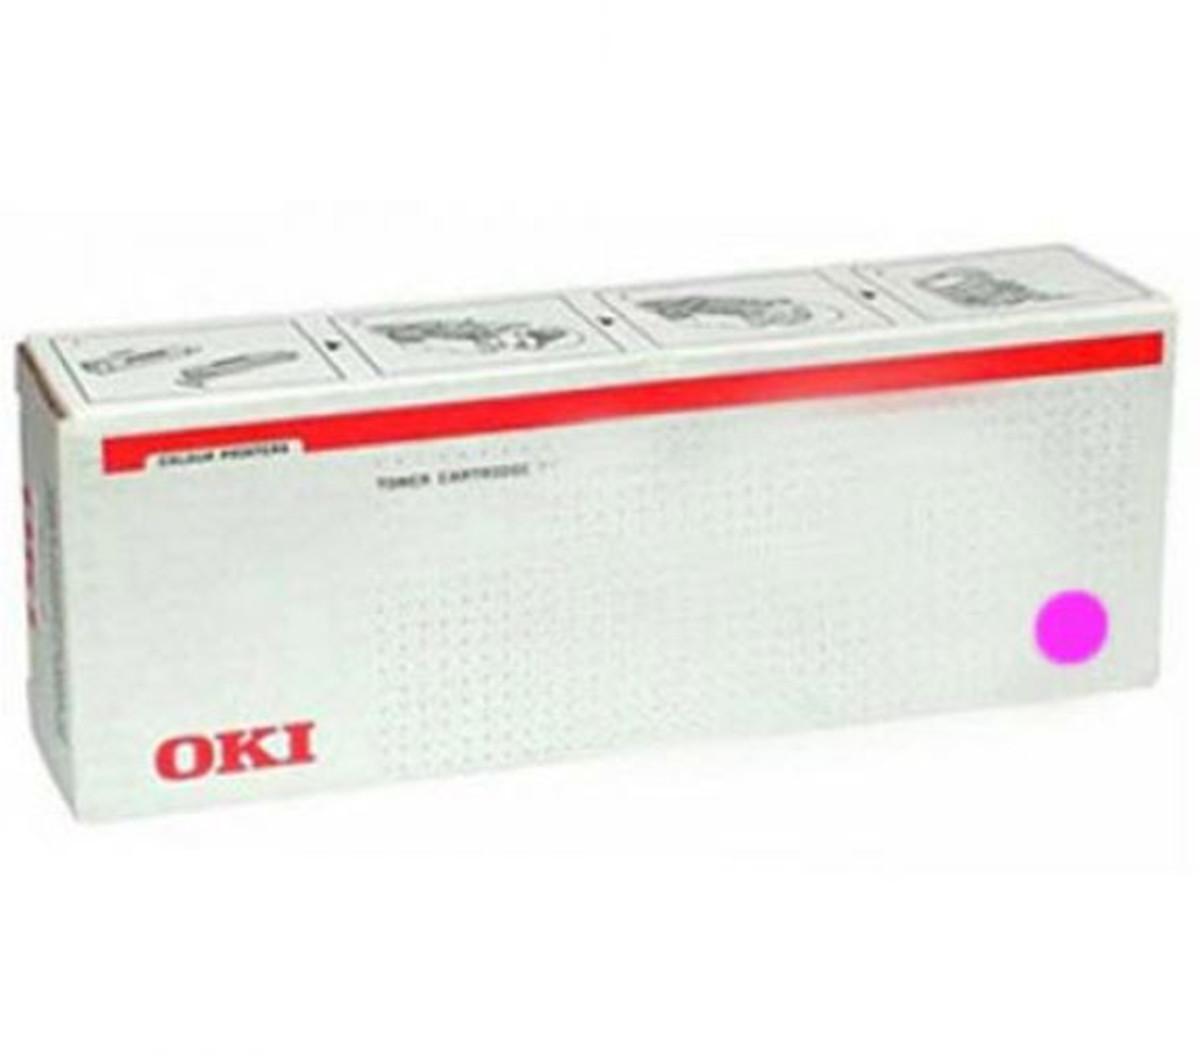 Oki 46508718 Magenta Toner Cartridge